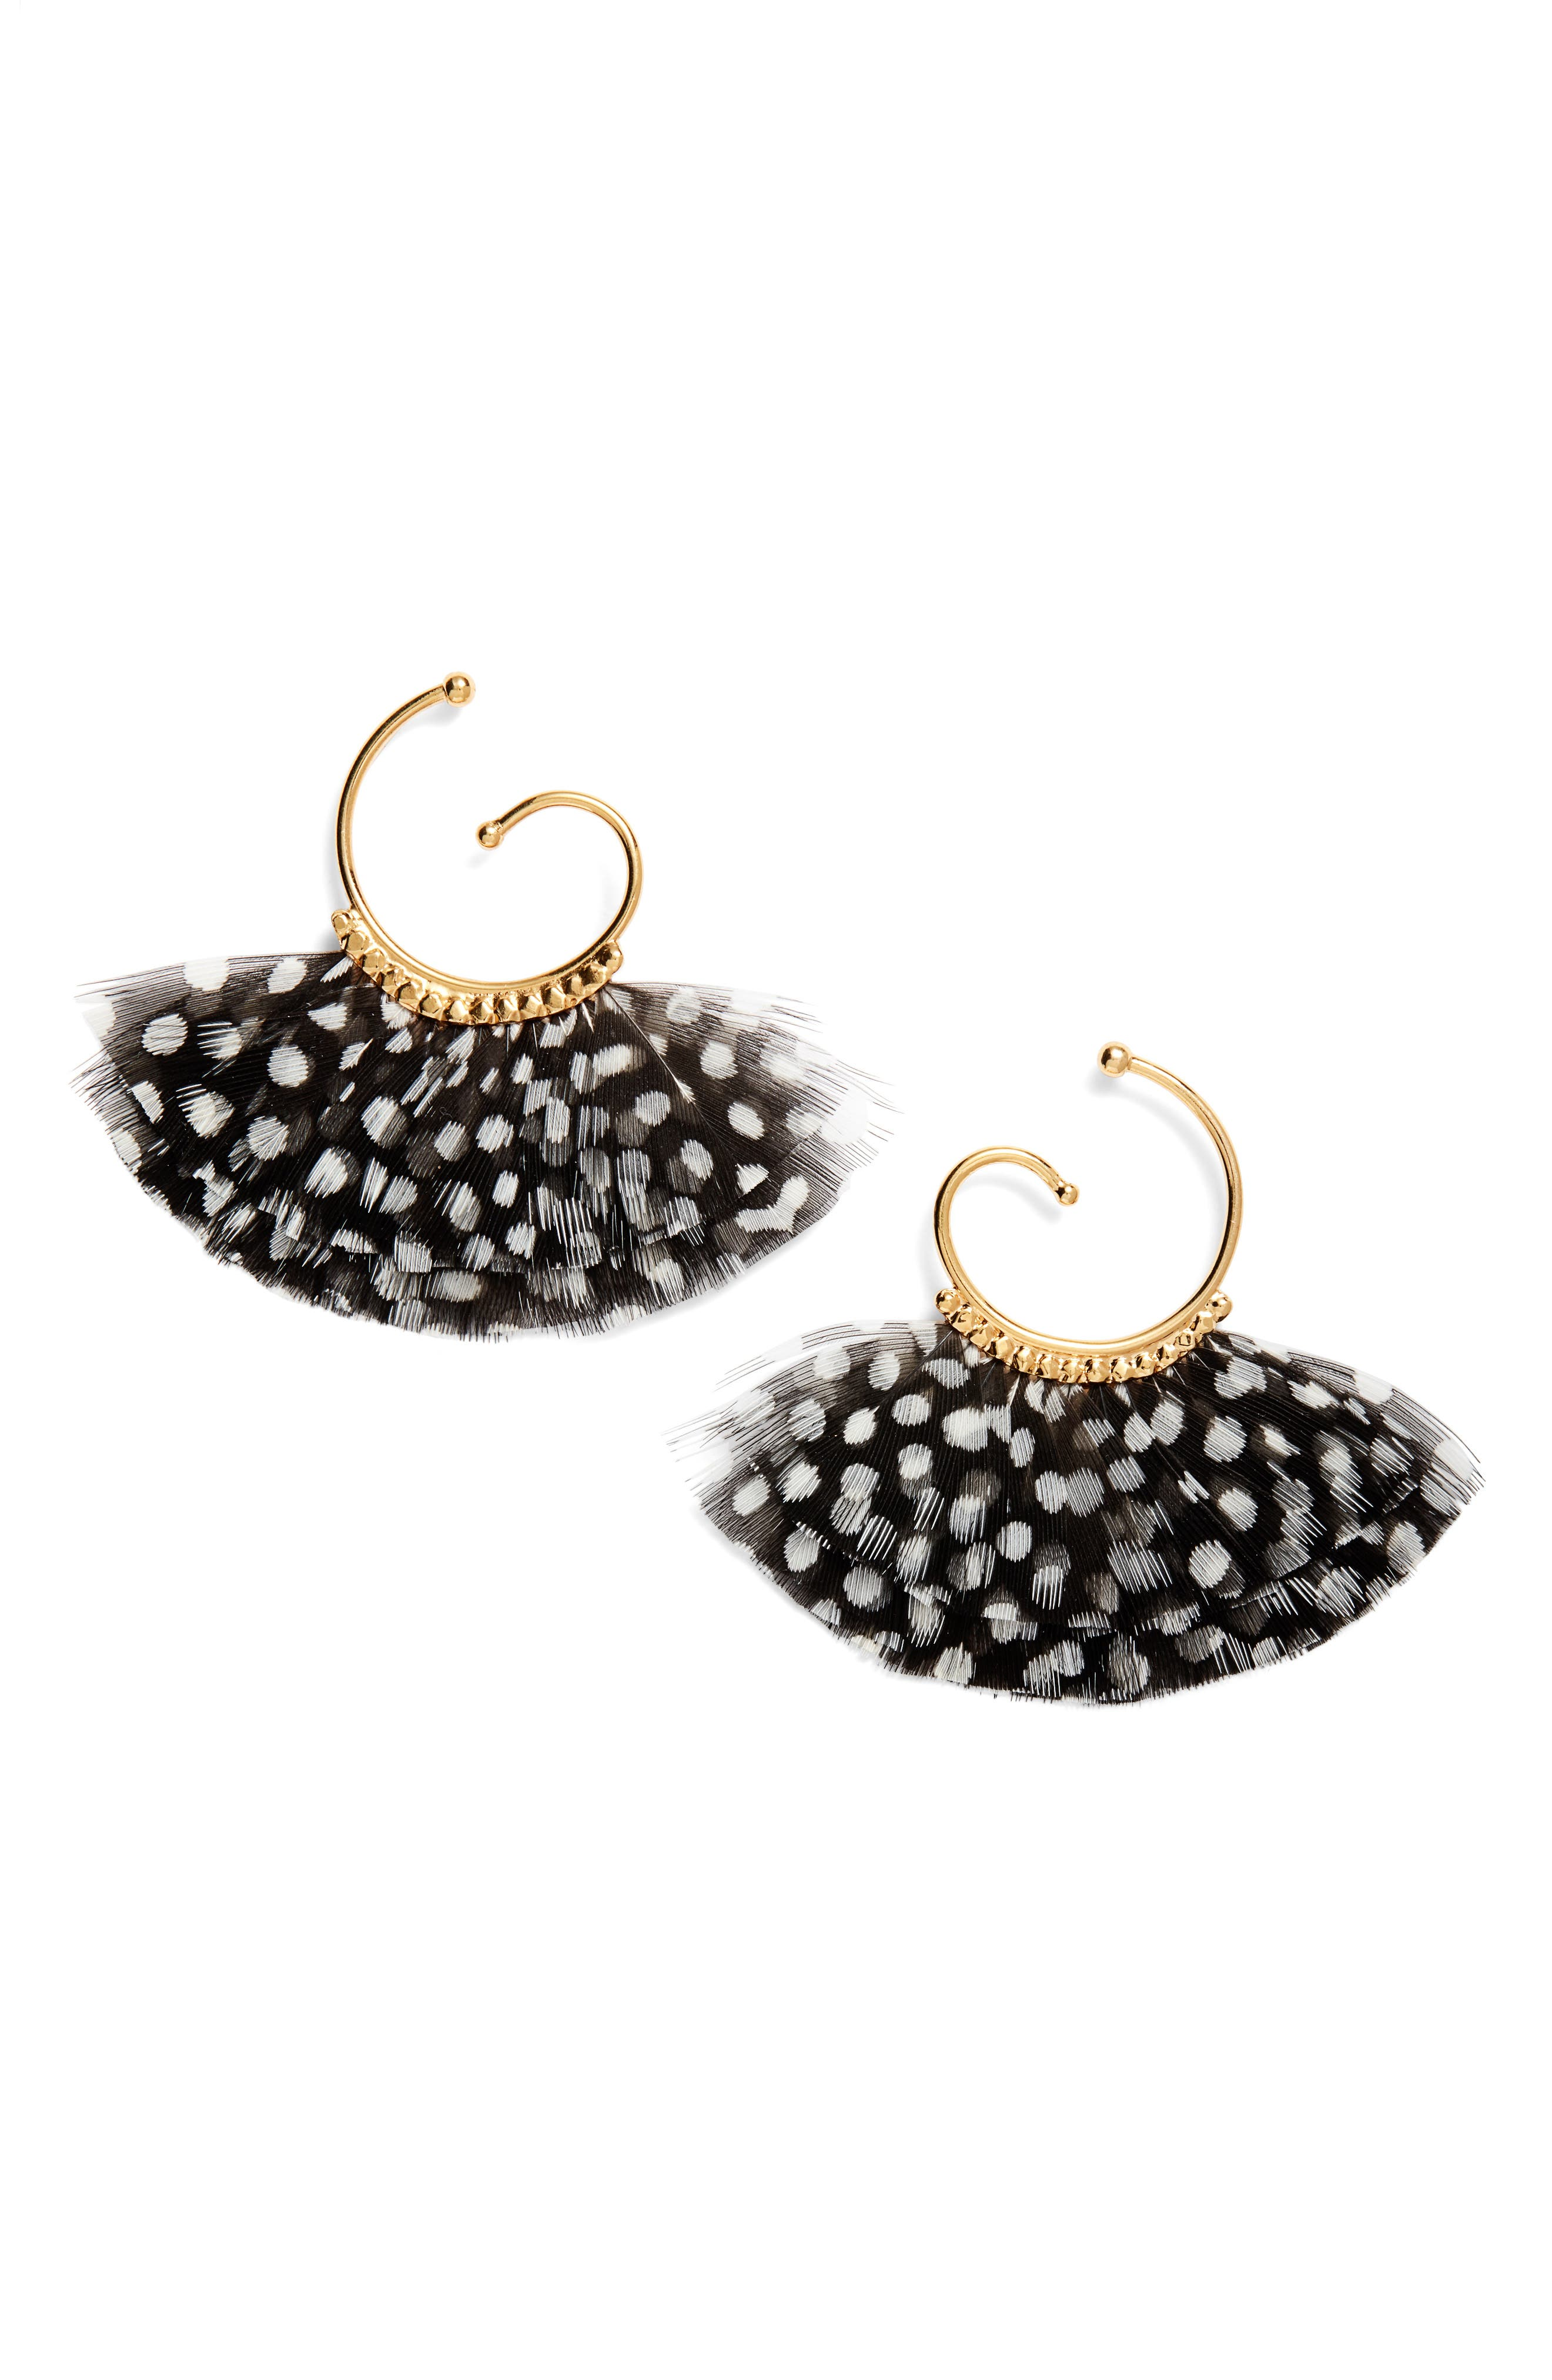 Buzios Feather Hoop Earrings,                             Main thumbnail 1, color,                             BLACK